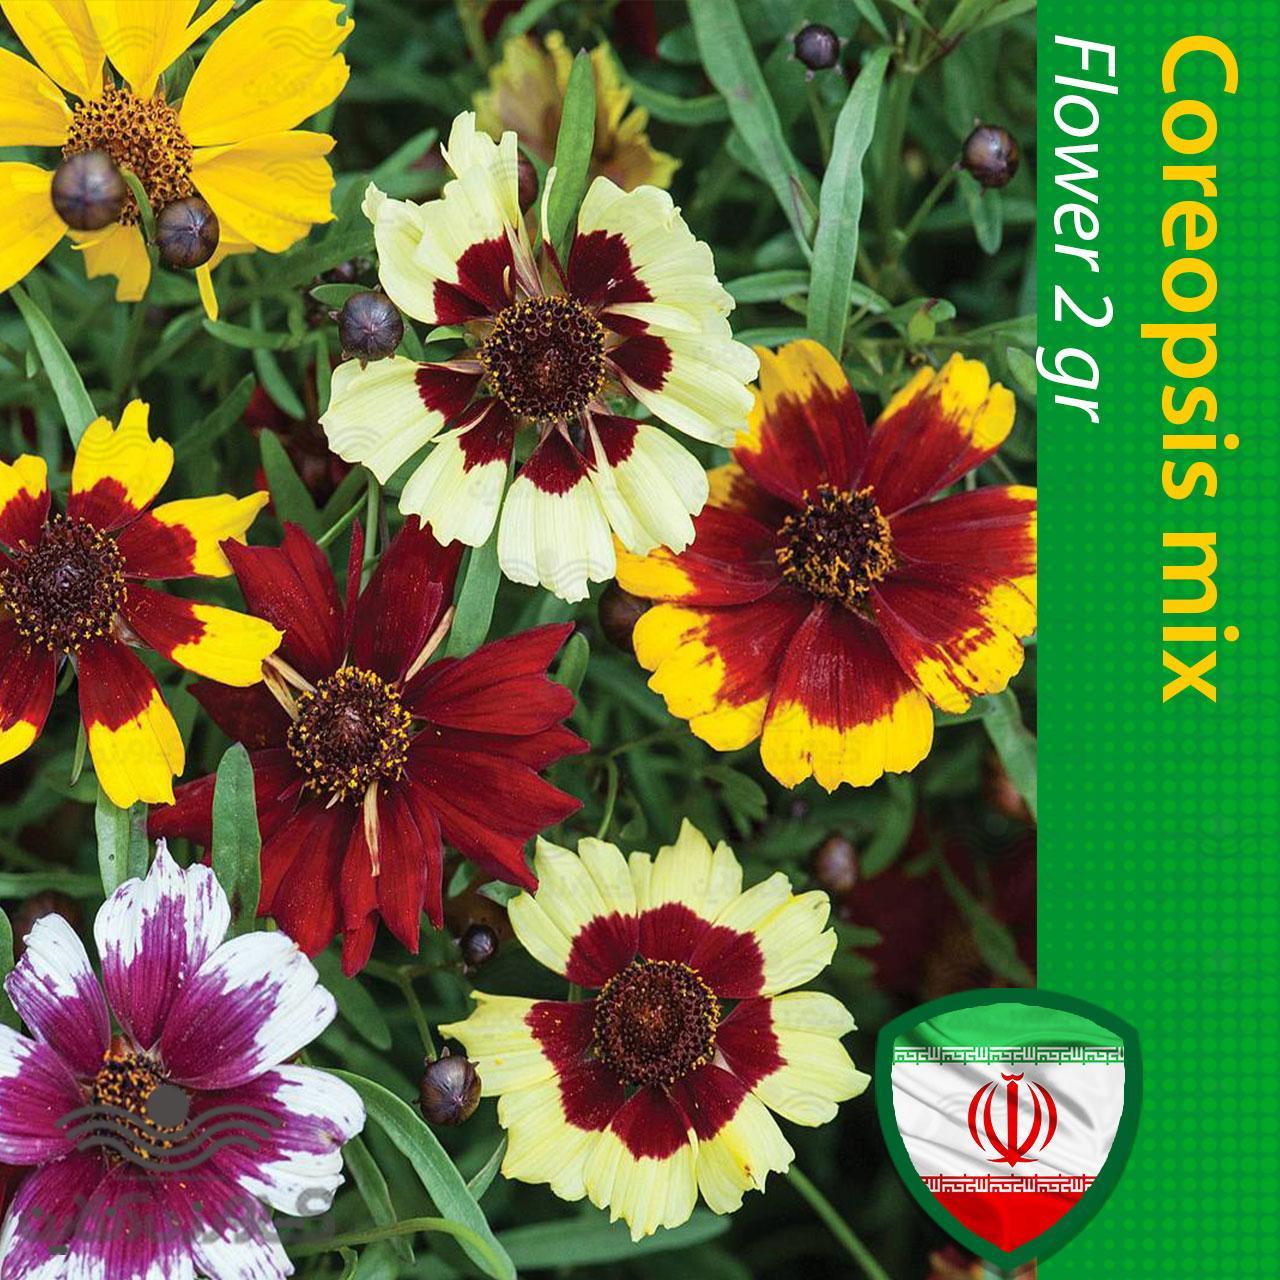 بذر گل کوریوپسیس اشرفی پا بلند الوان و روش کاشت